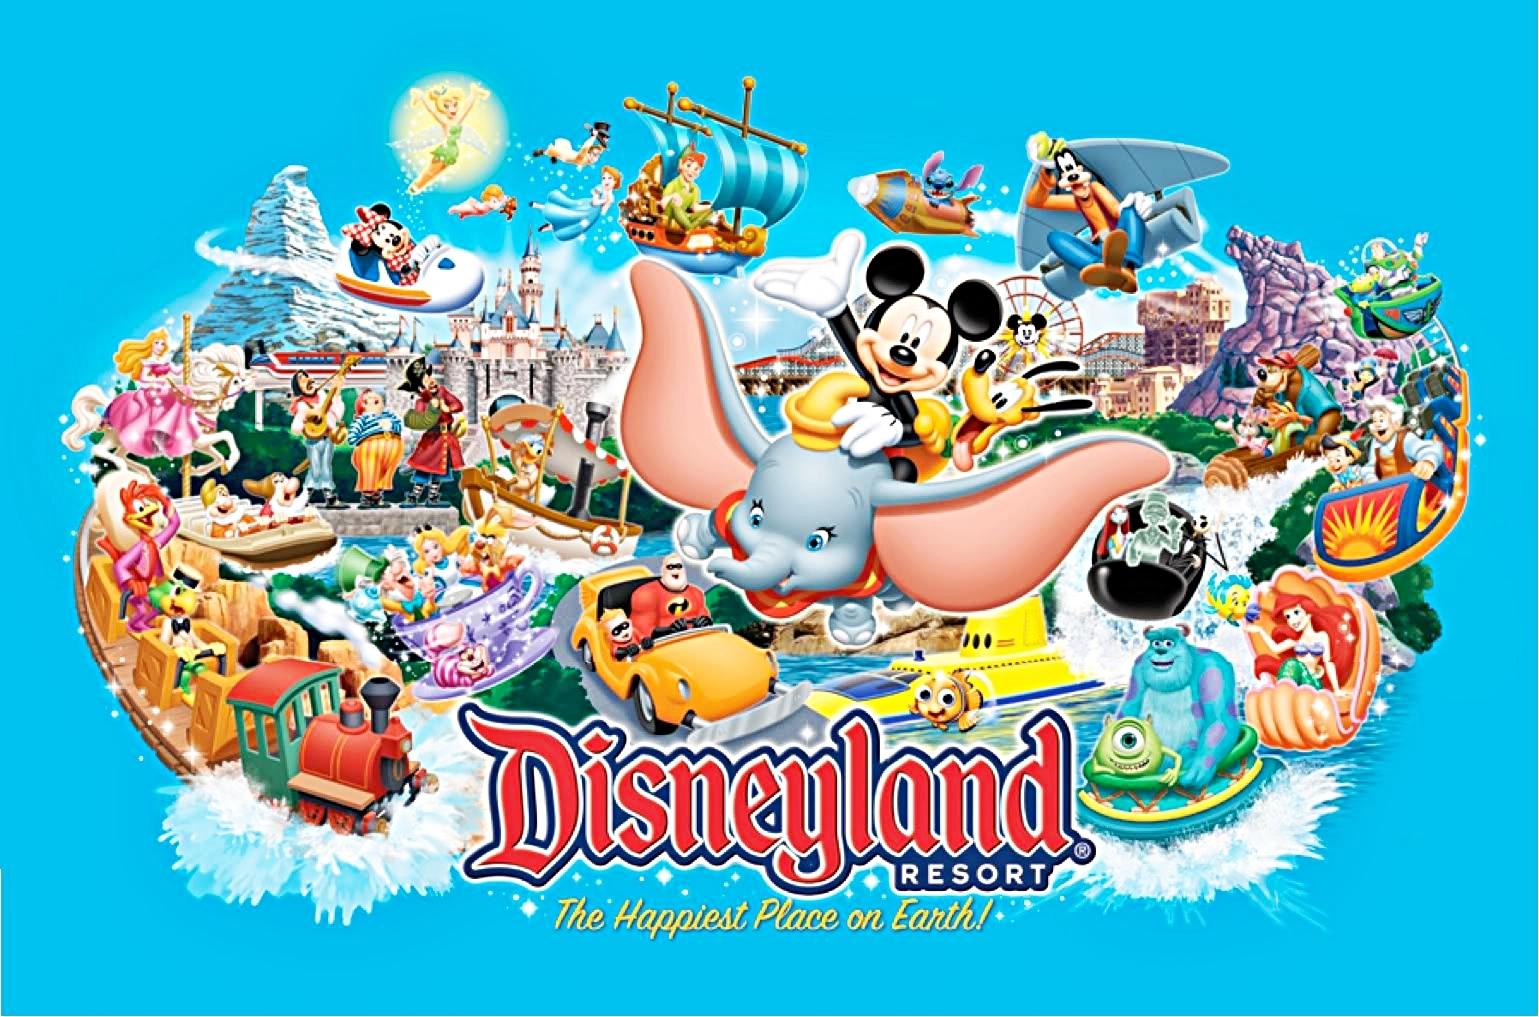 Comparing Disneyland Resorts - MickeyBlog.com